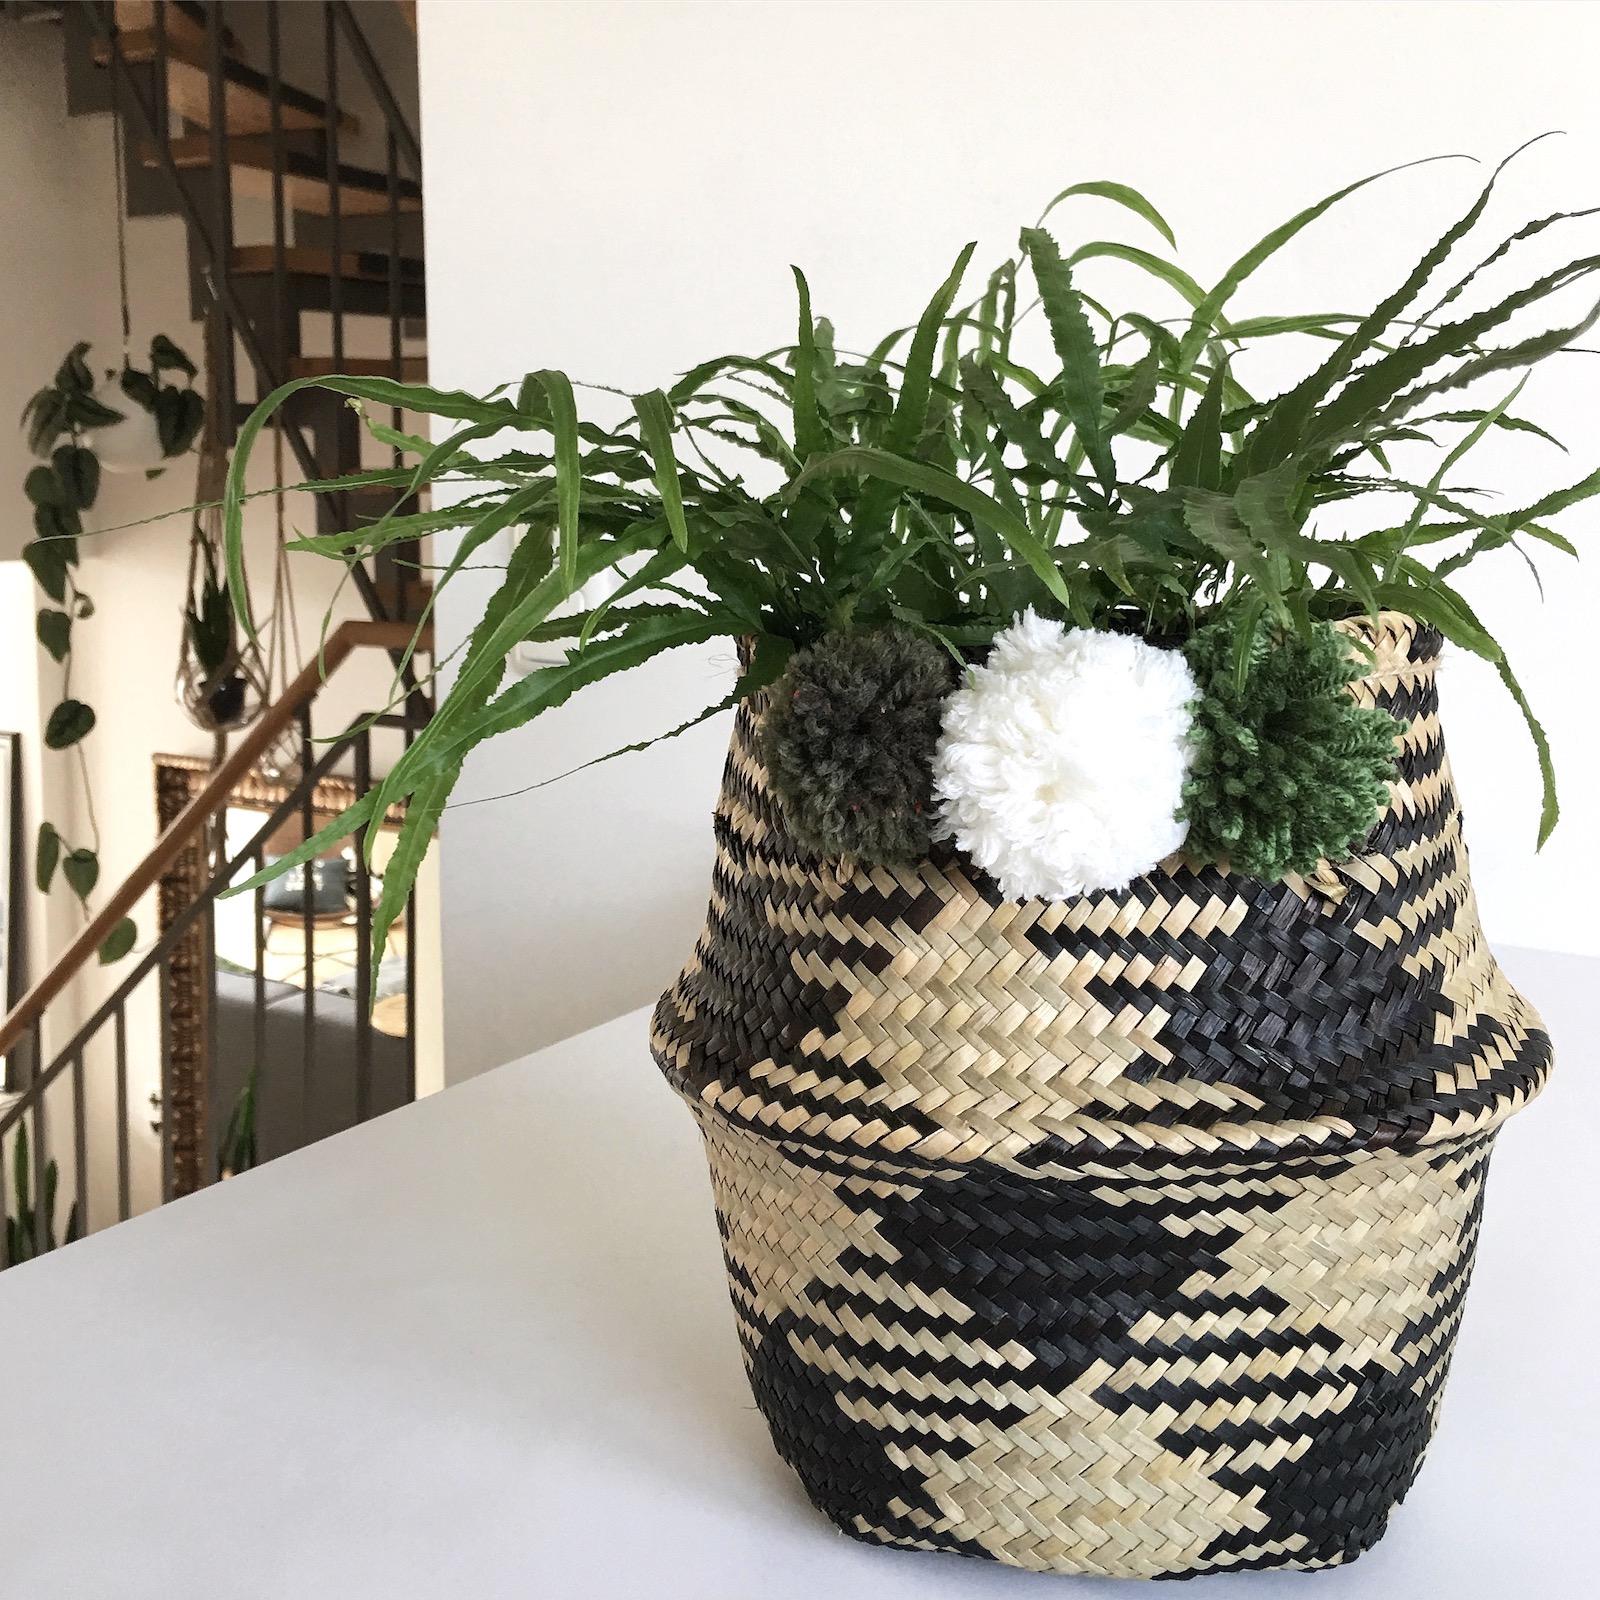 diy pom pom korb deko sophiagaleria sophiagaleria. Black Bedroom Furniture Sets. Home Design Ideas